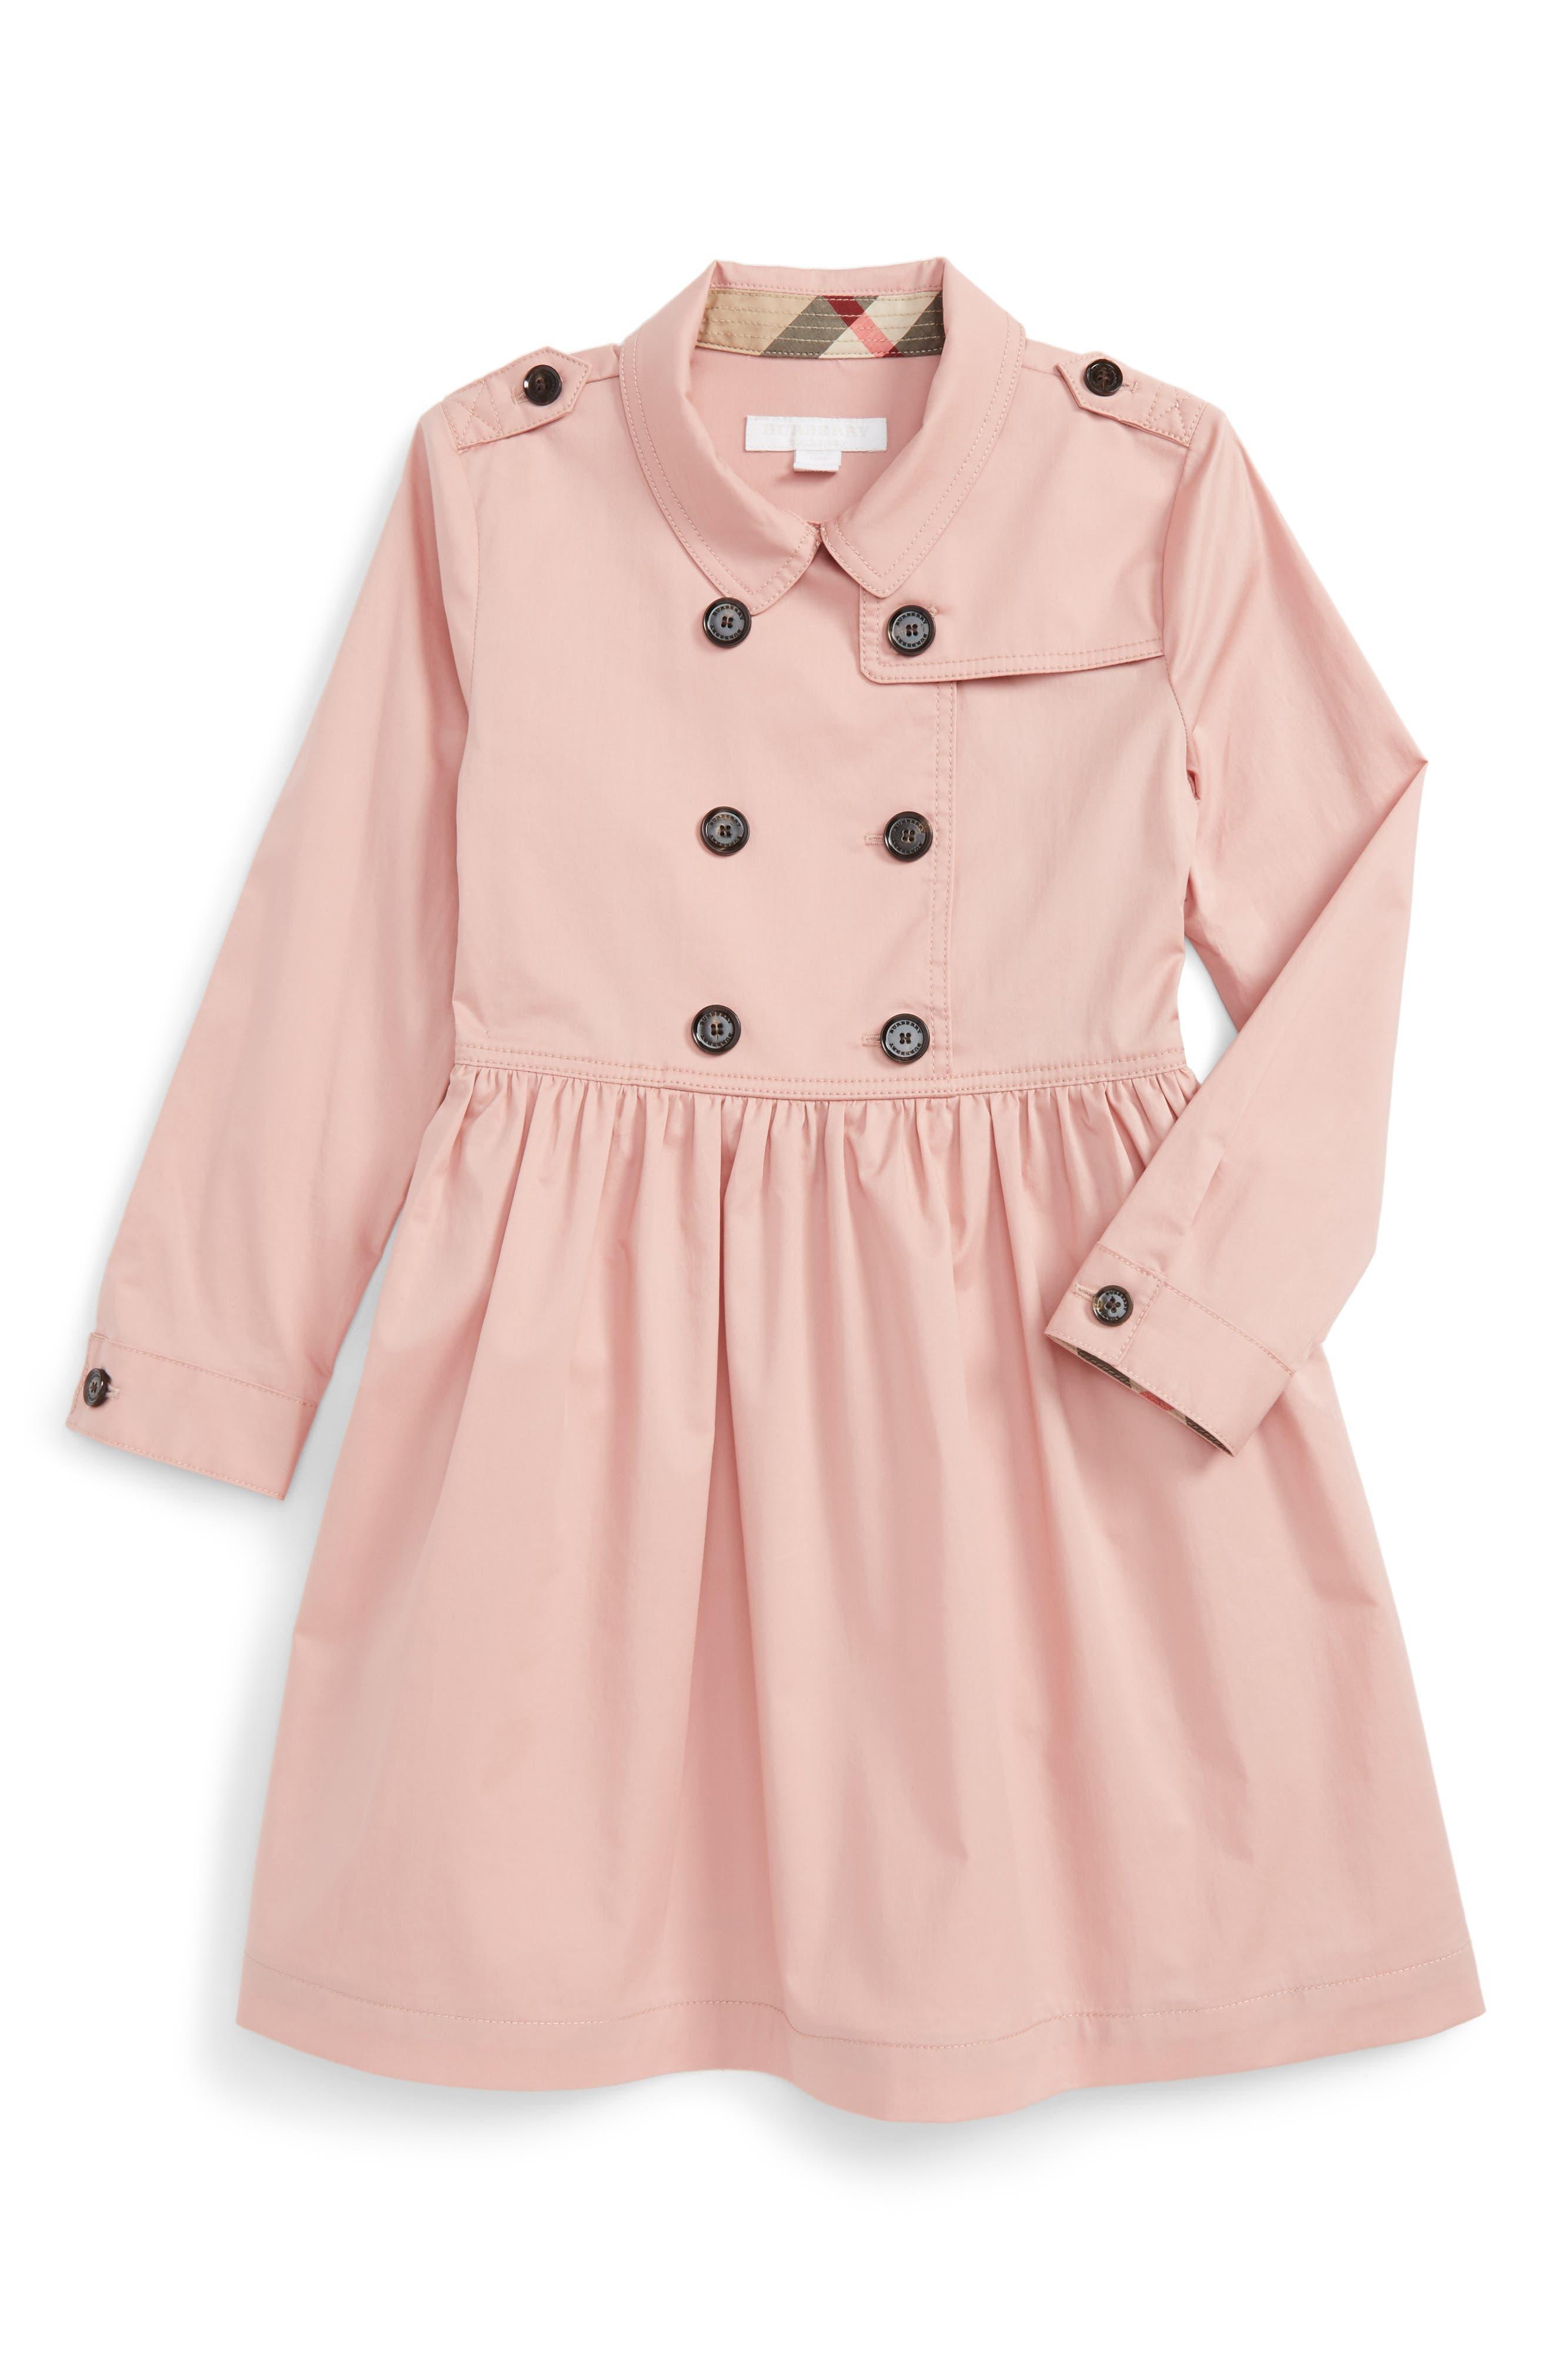 Main Image - Burberry Lillyana Trench Dress (Little Girls & Big Girls)